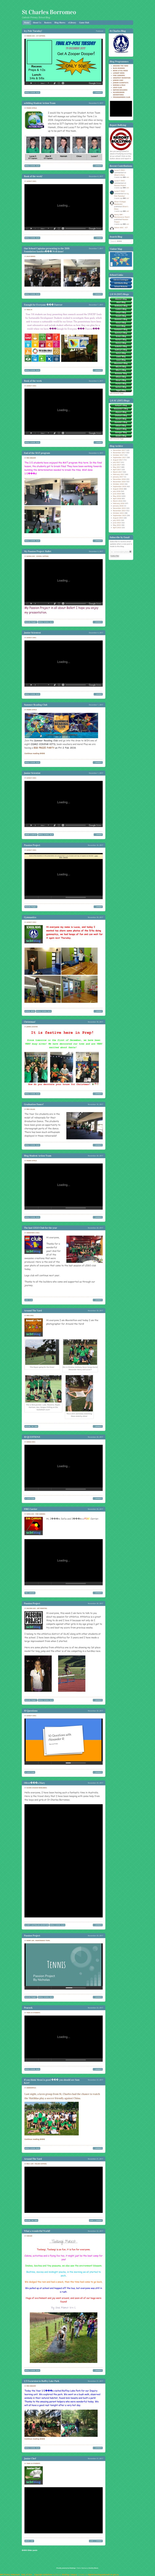 St Charles Borromeo | Catholic Primary School blog run by a student action team from grades 1-6 | Amazing example | Edublogs